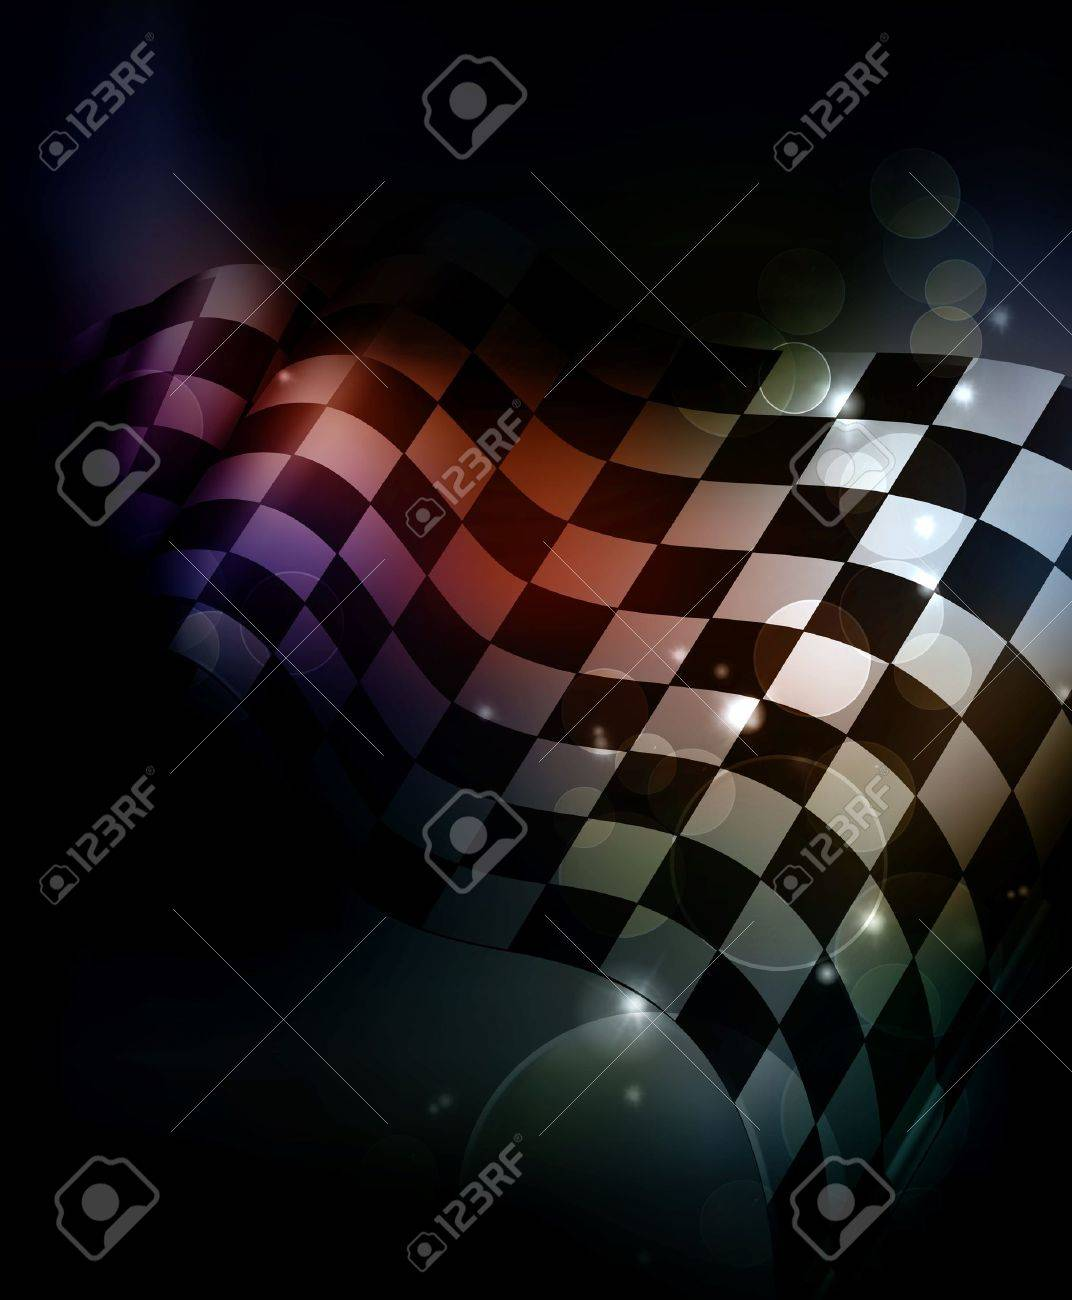 Dark Checkered Background Stock Vector - 13833710